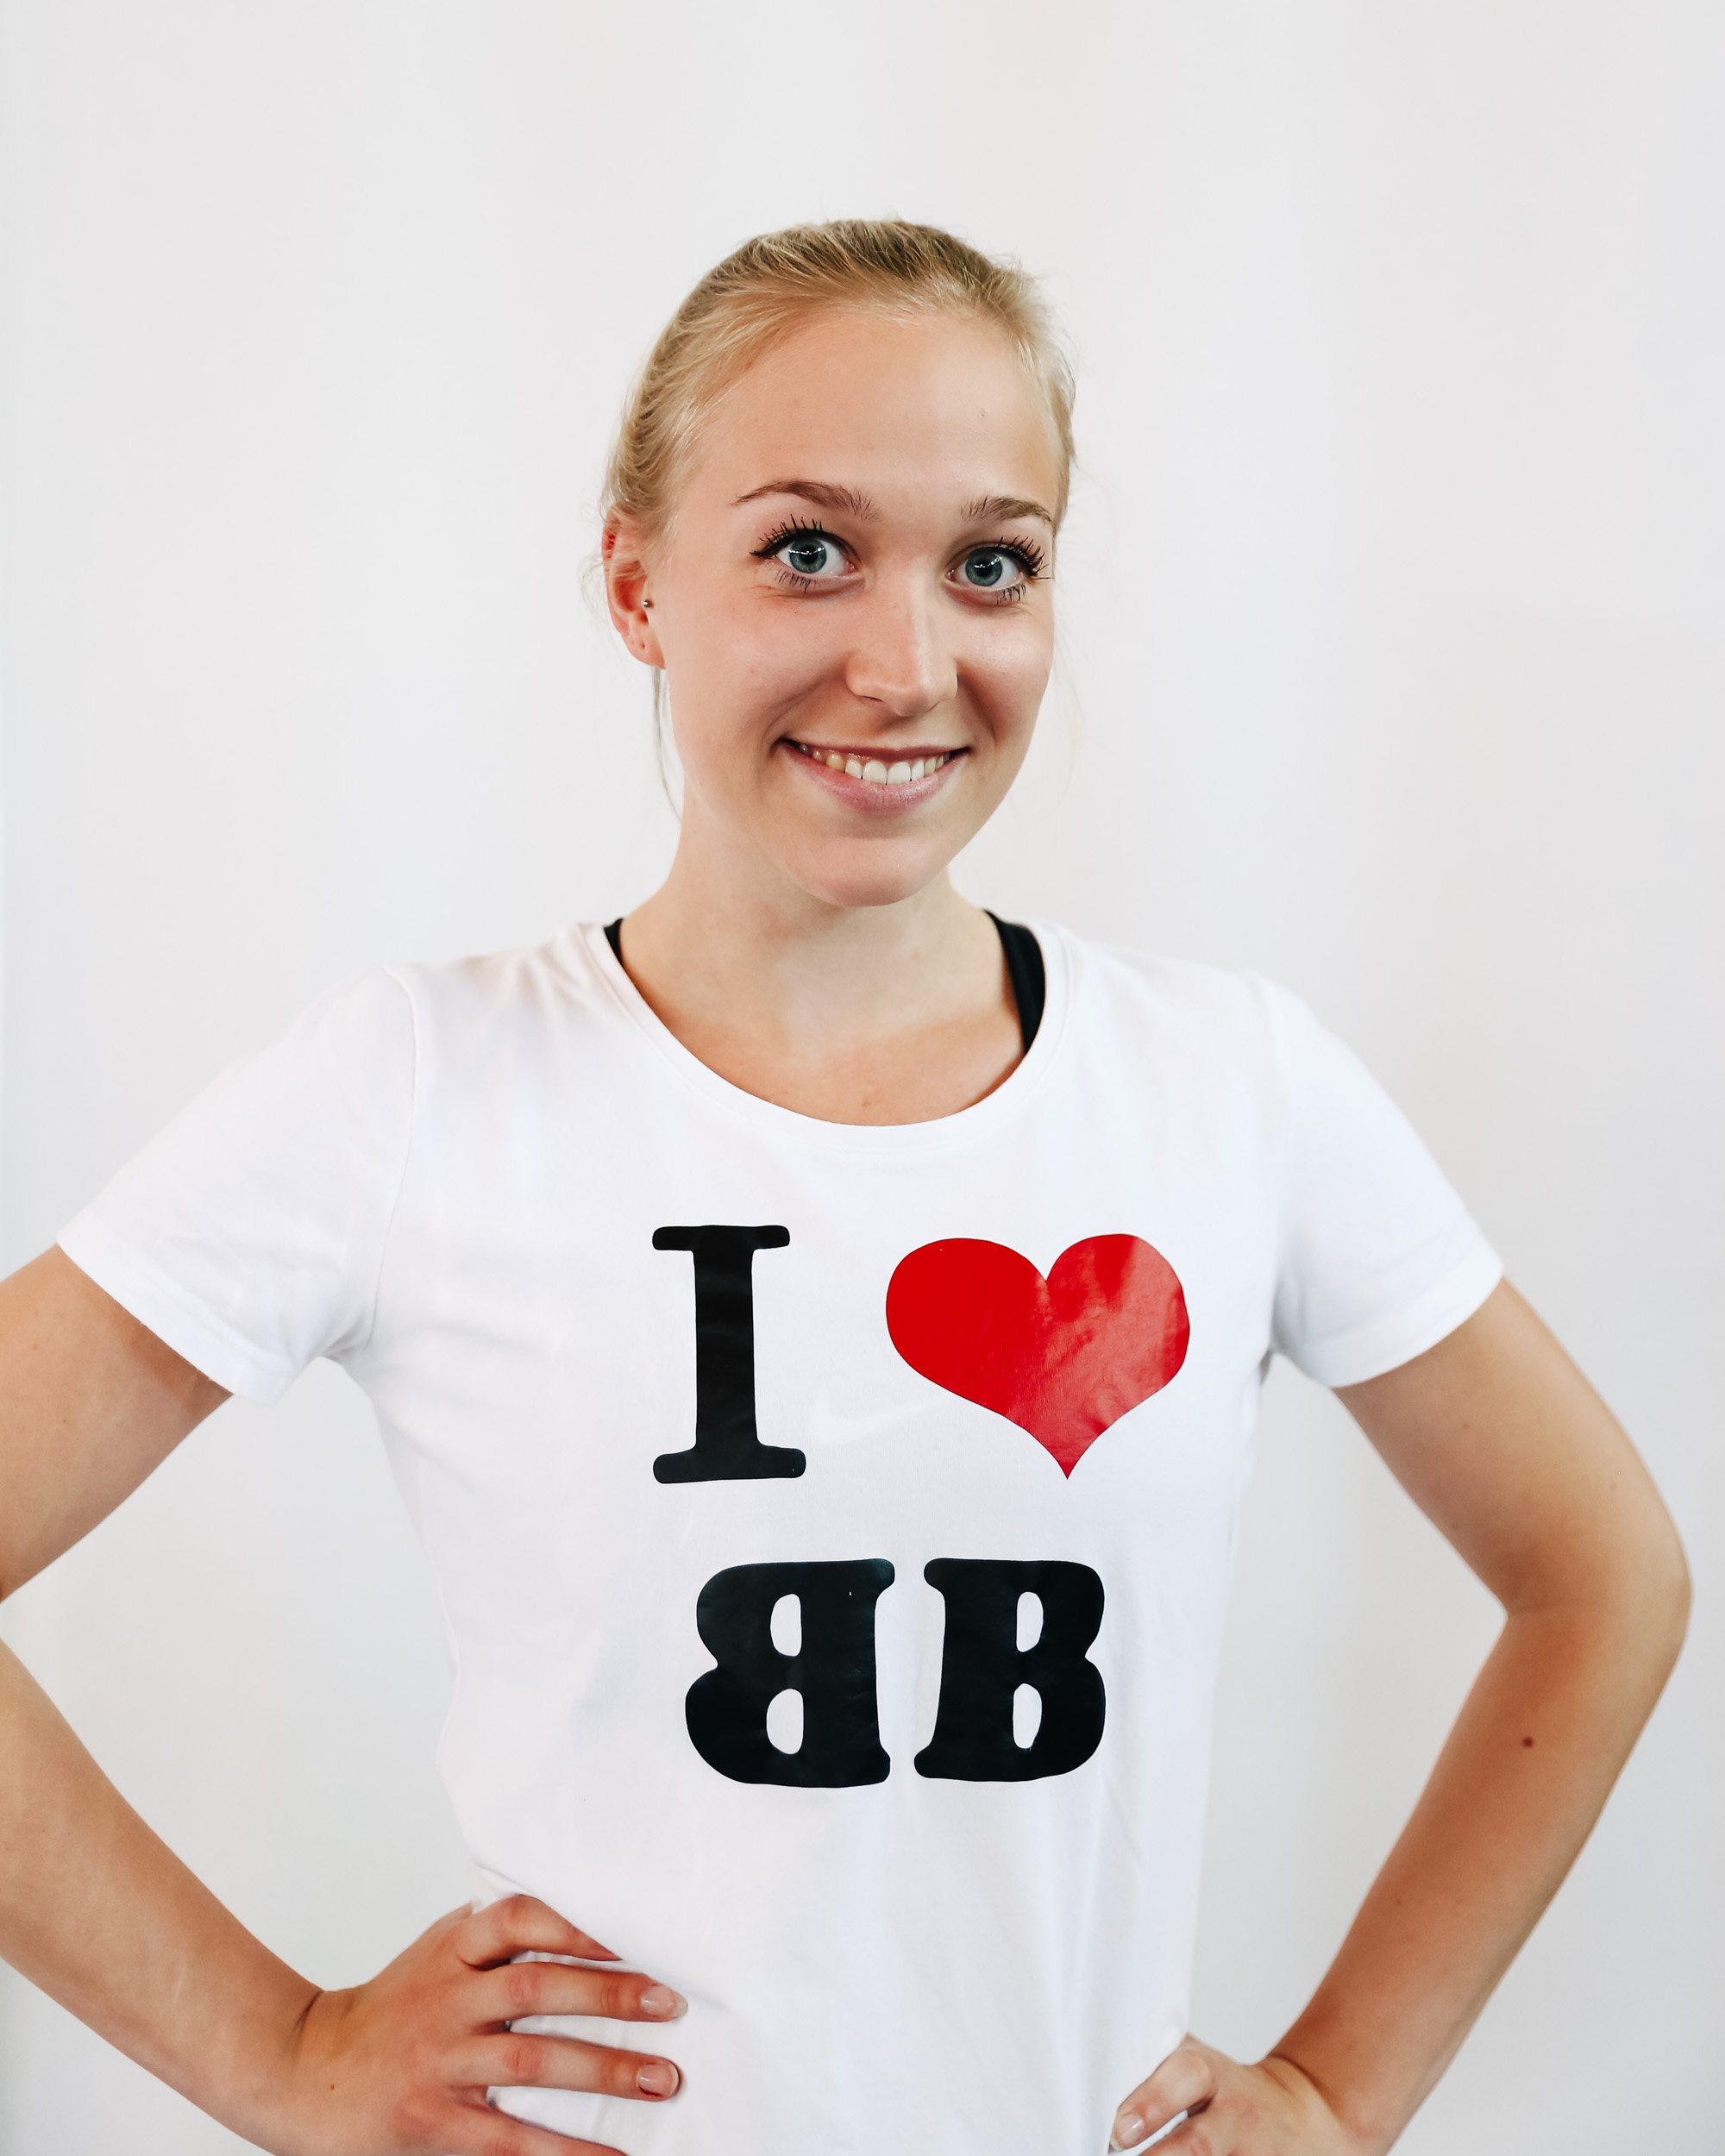 Nicola Jungbäck